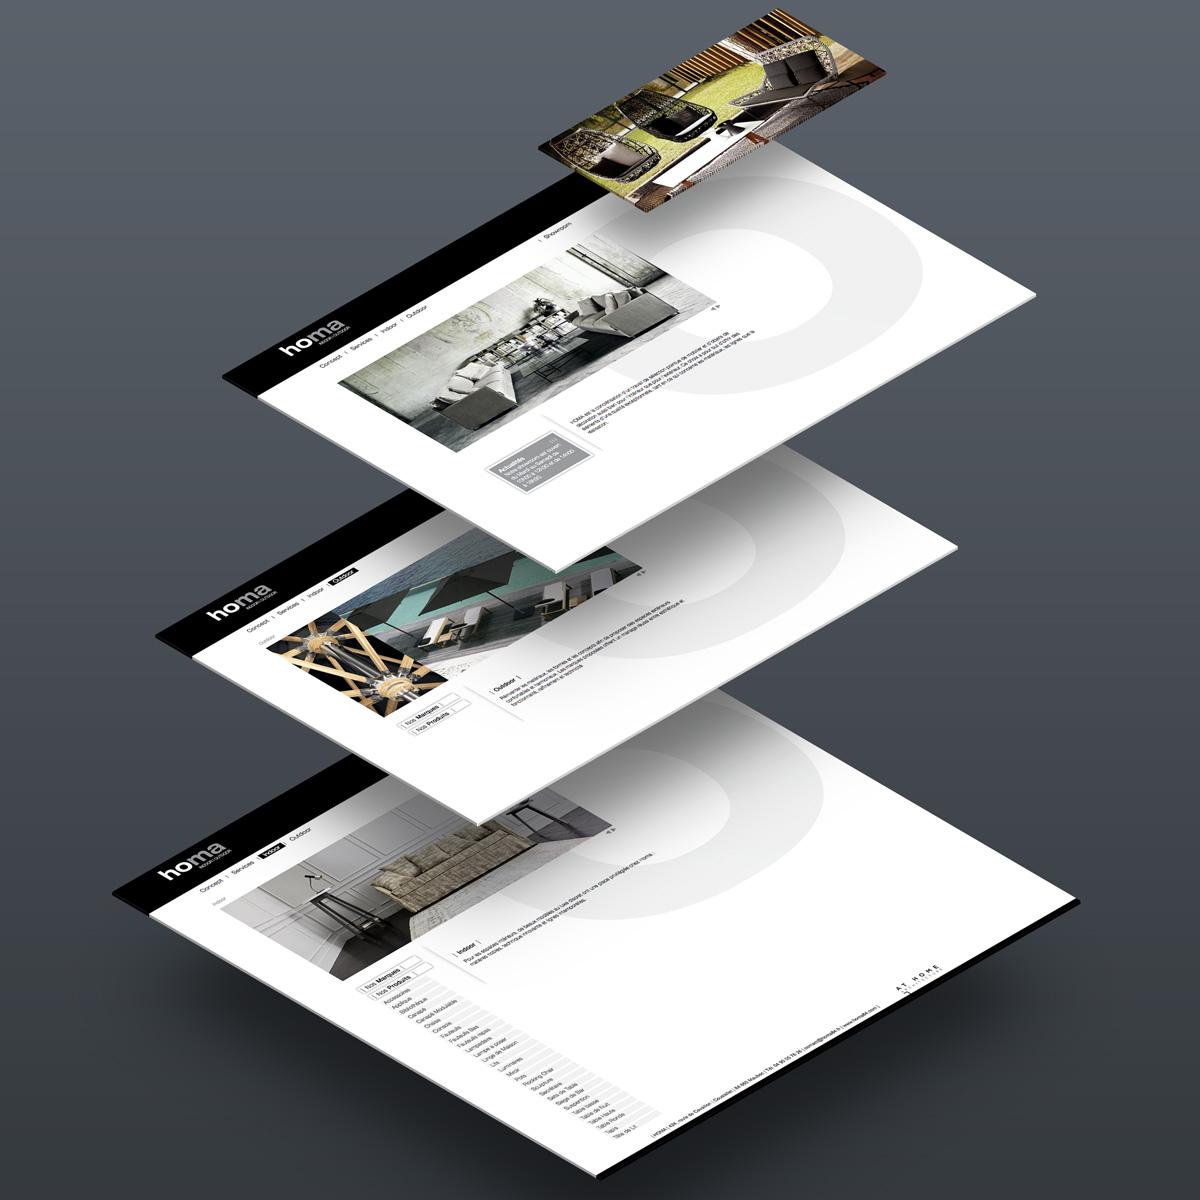 Webs-Screens-Presentation-Mock-up.jpg